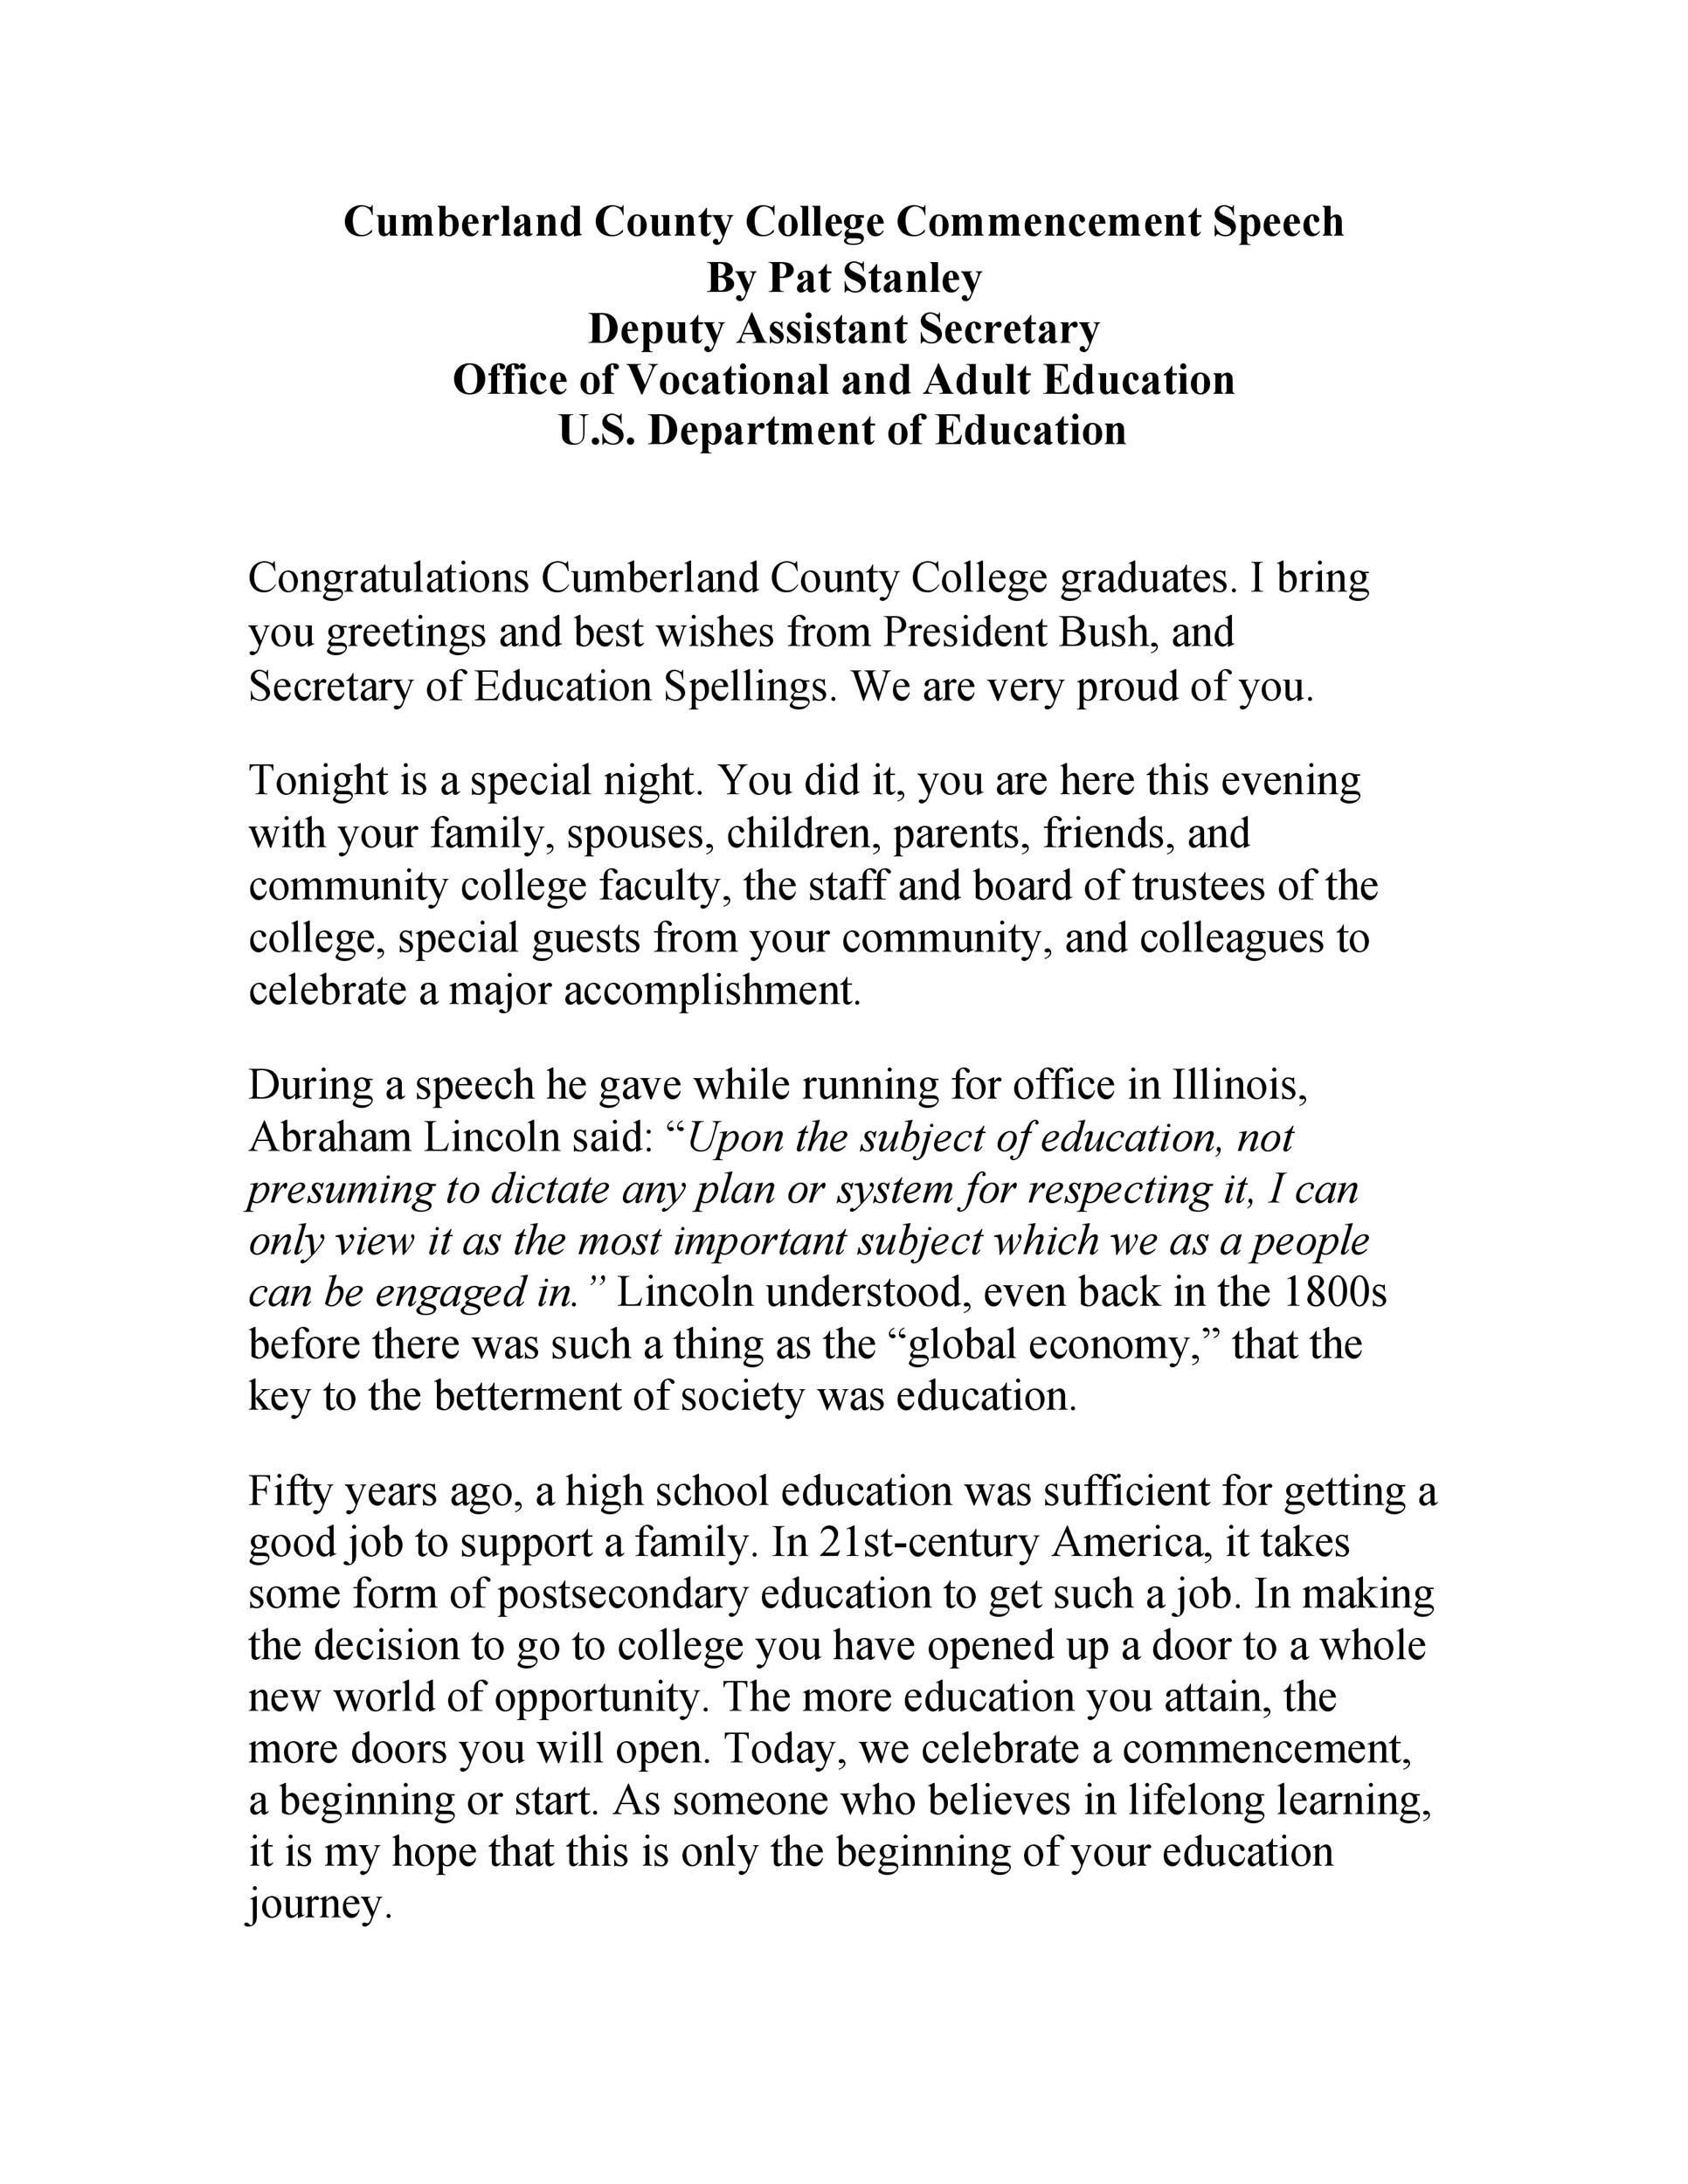 Free graduation speech example 06